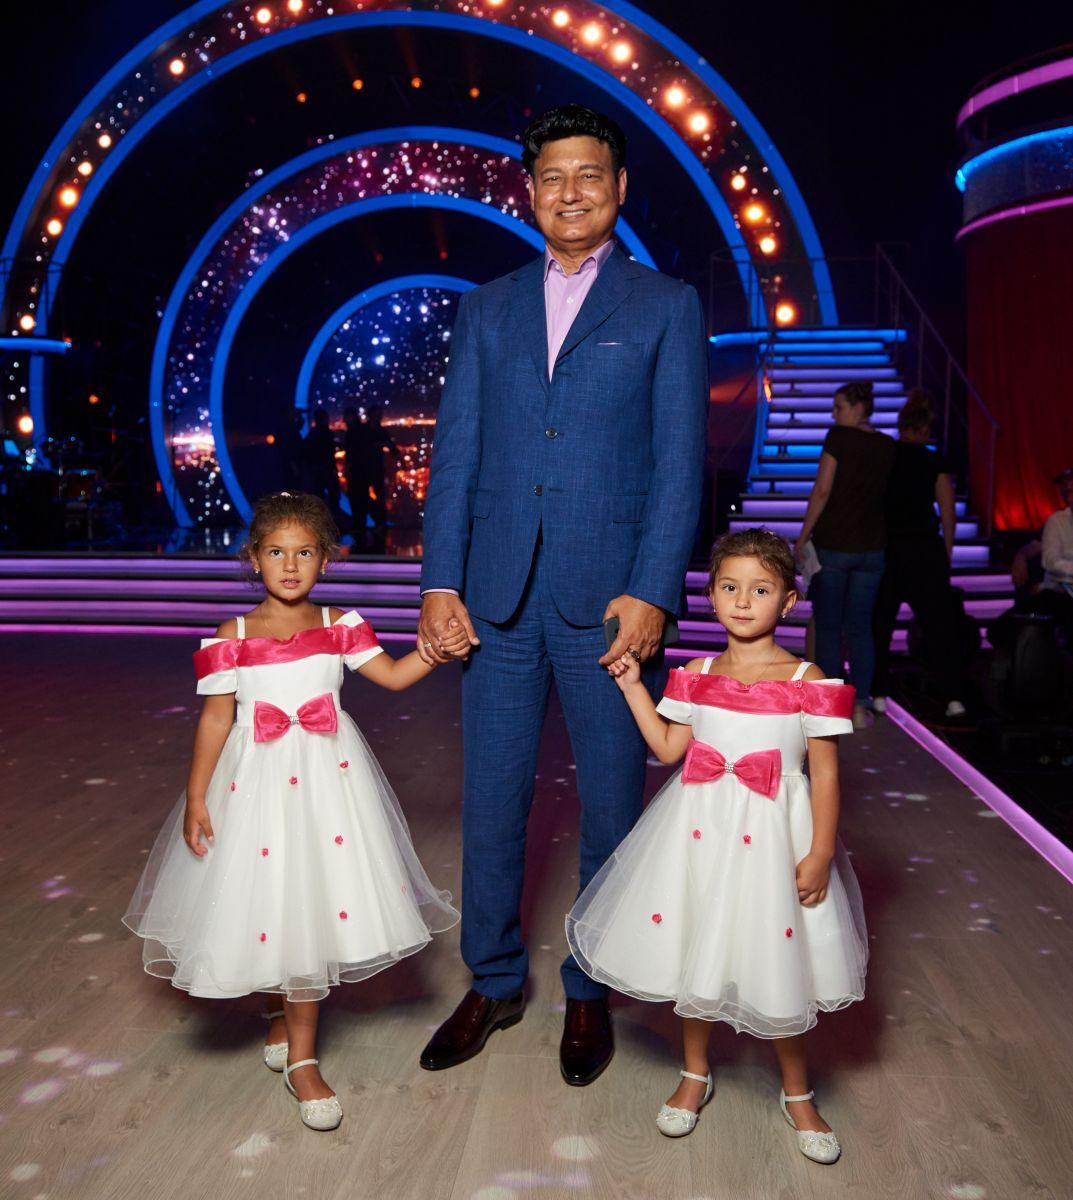 Муж Камалии Мохаммад Захур с дочками Арабеллой и Мирабеллой